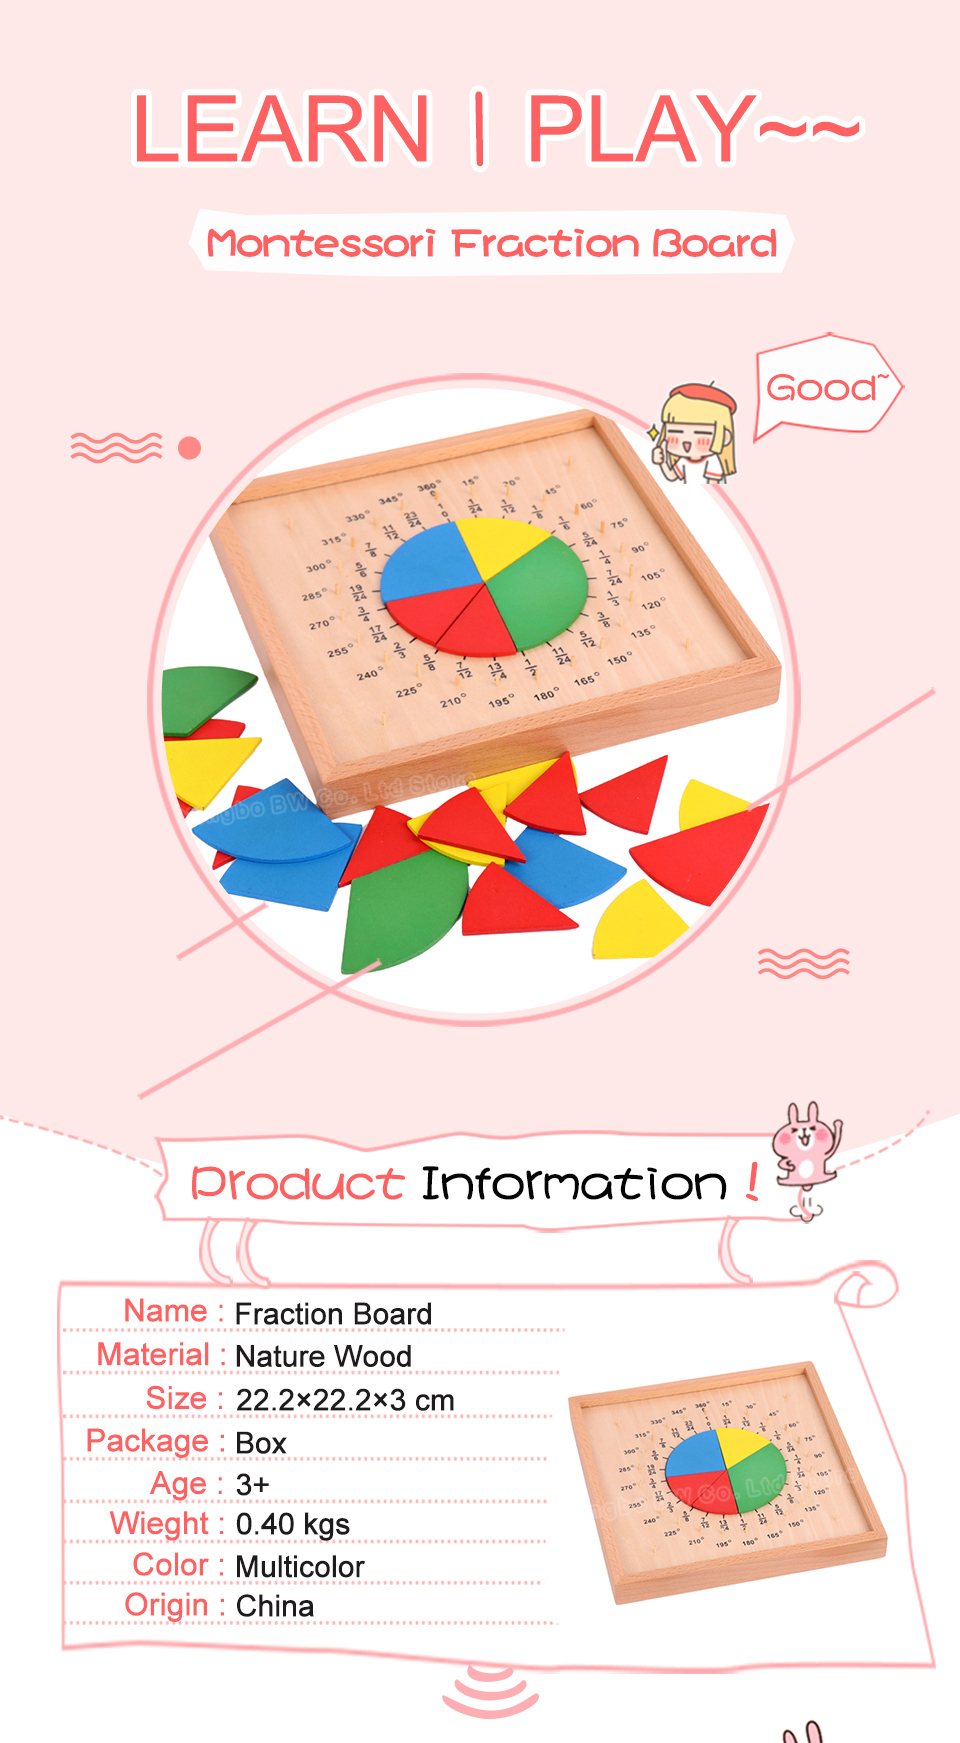 Baby Toys Wooden Building Chopping Block Brand Fraction Board Rotary Tattoo Machine Diagram Sayaka 01 02 03 04